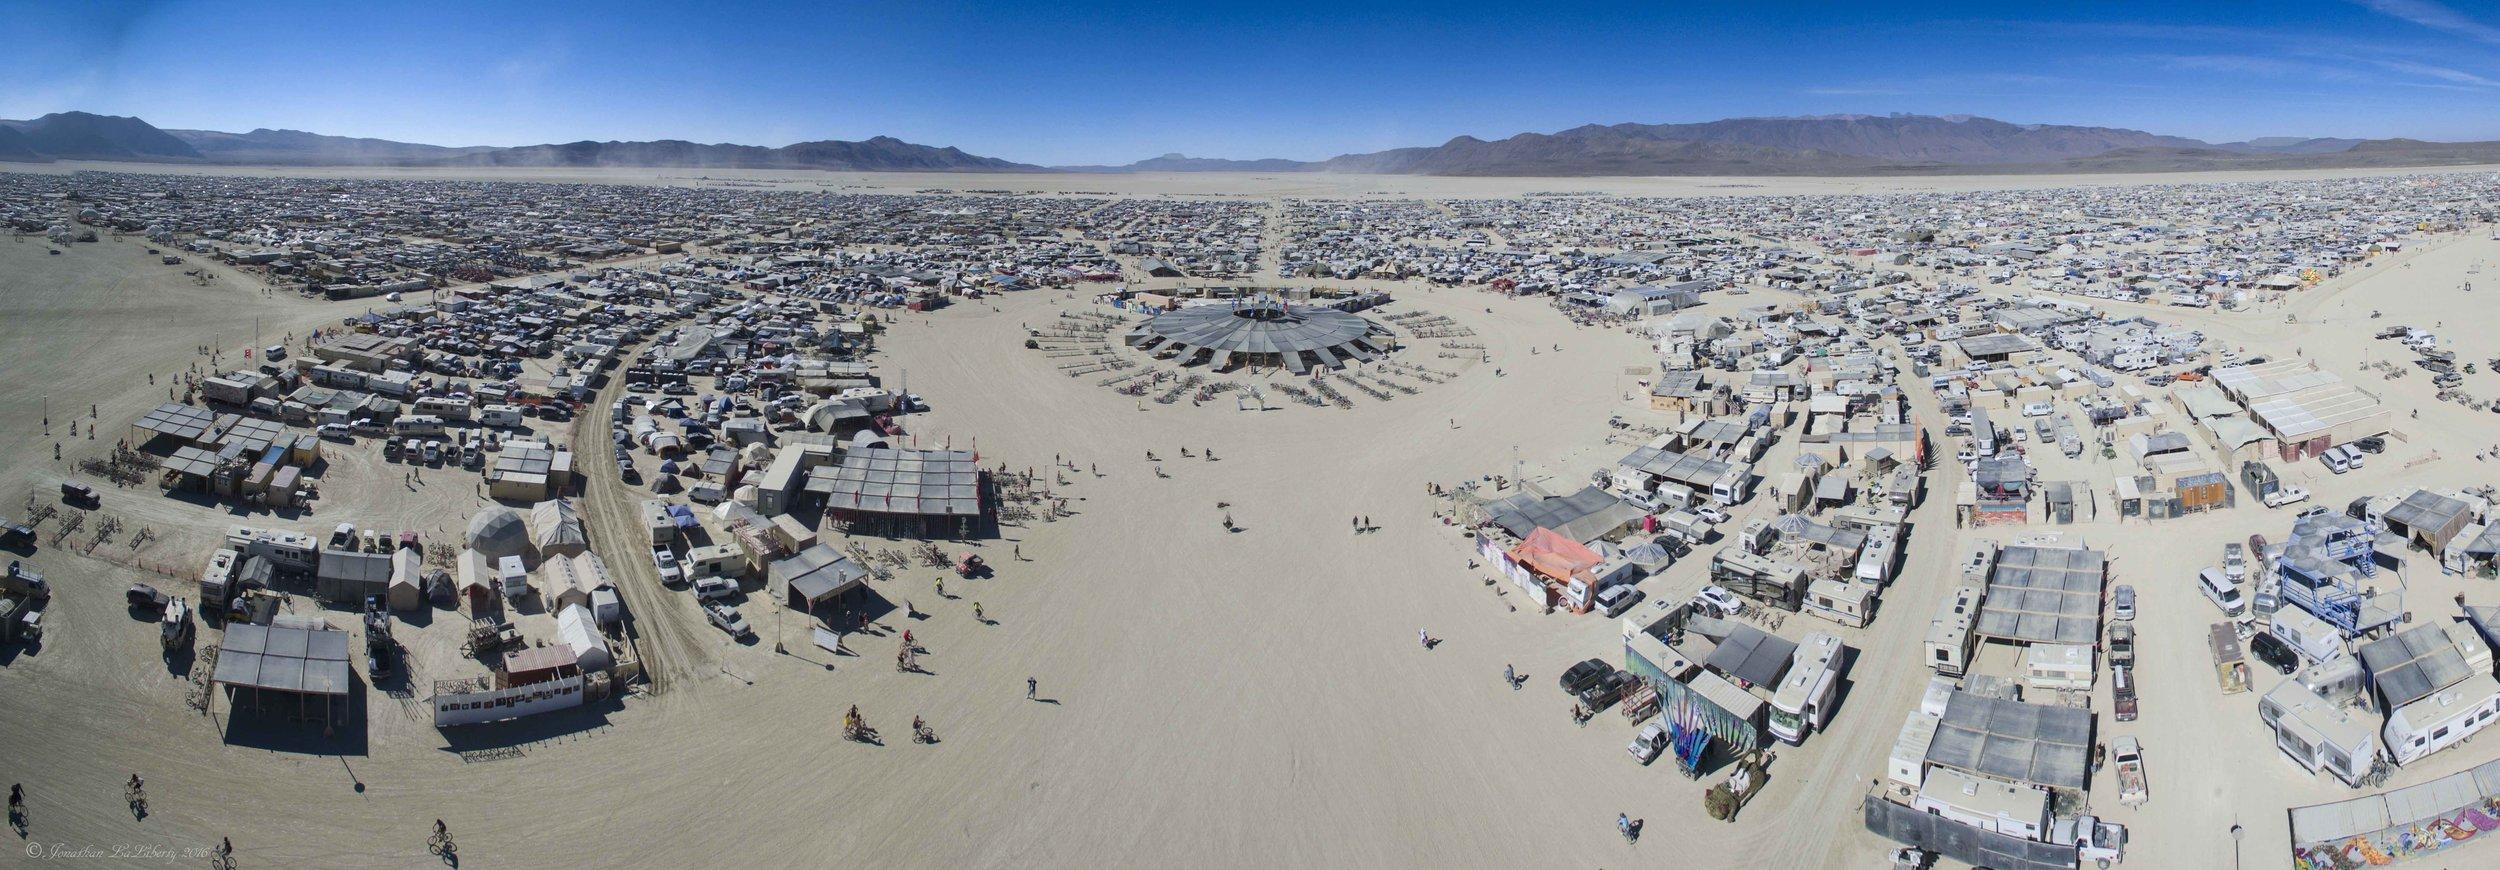 Burning Man Panorama Drone Photography 2016 Black Rock City